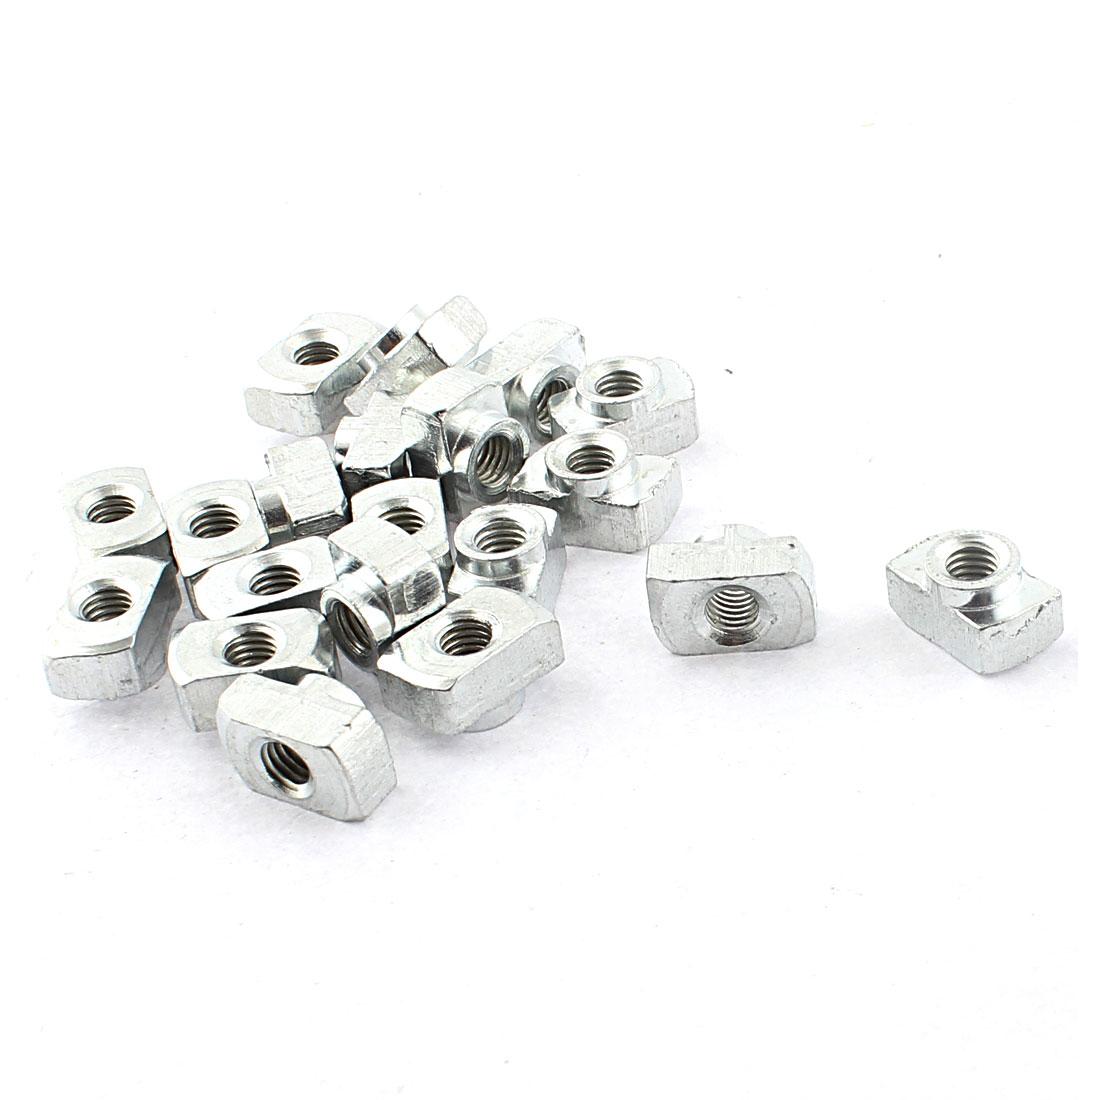 M5 Female Thread 40 Series T Slot Hammer Head Drop-in Nut Silver Tone 20pcs